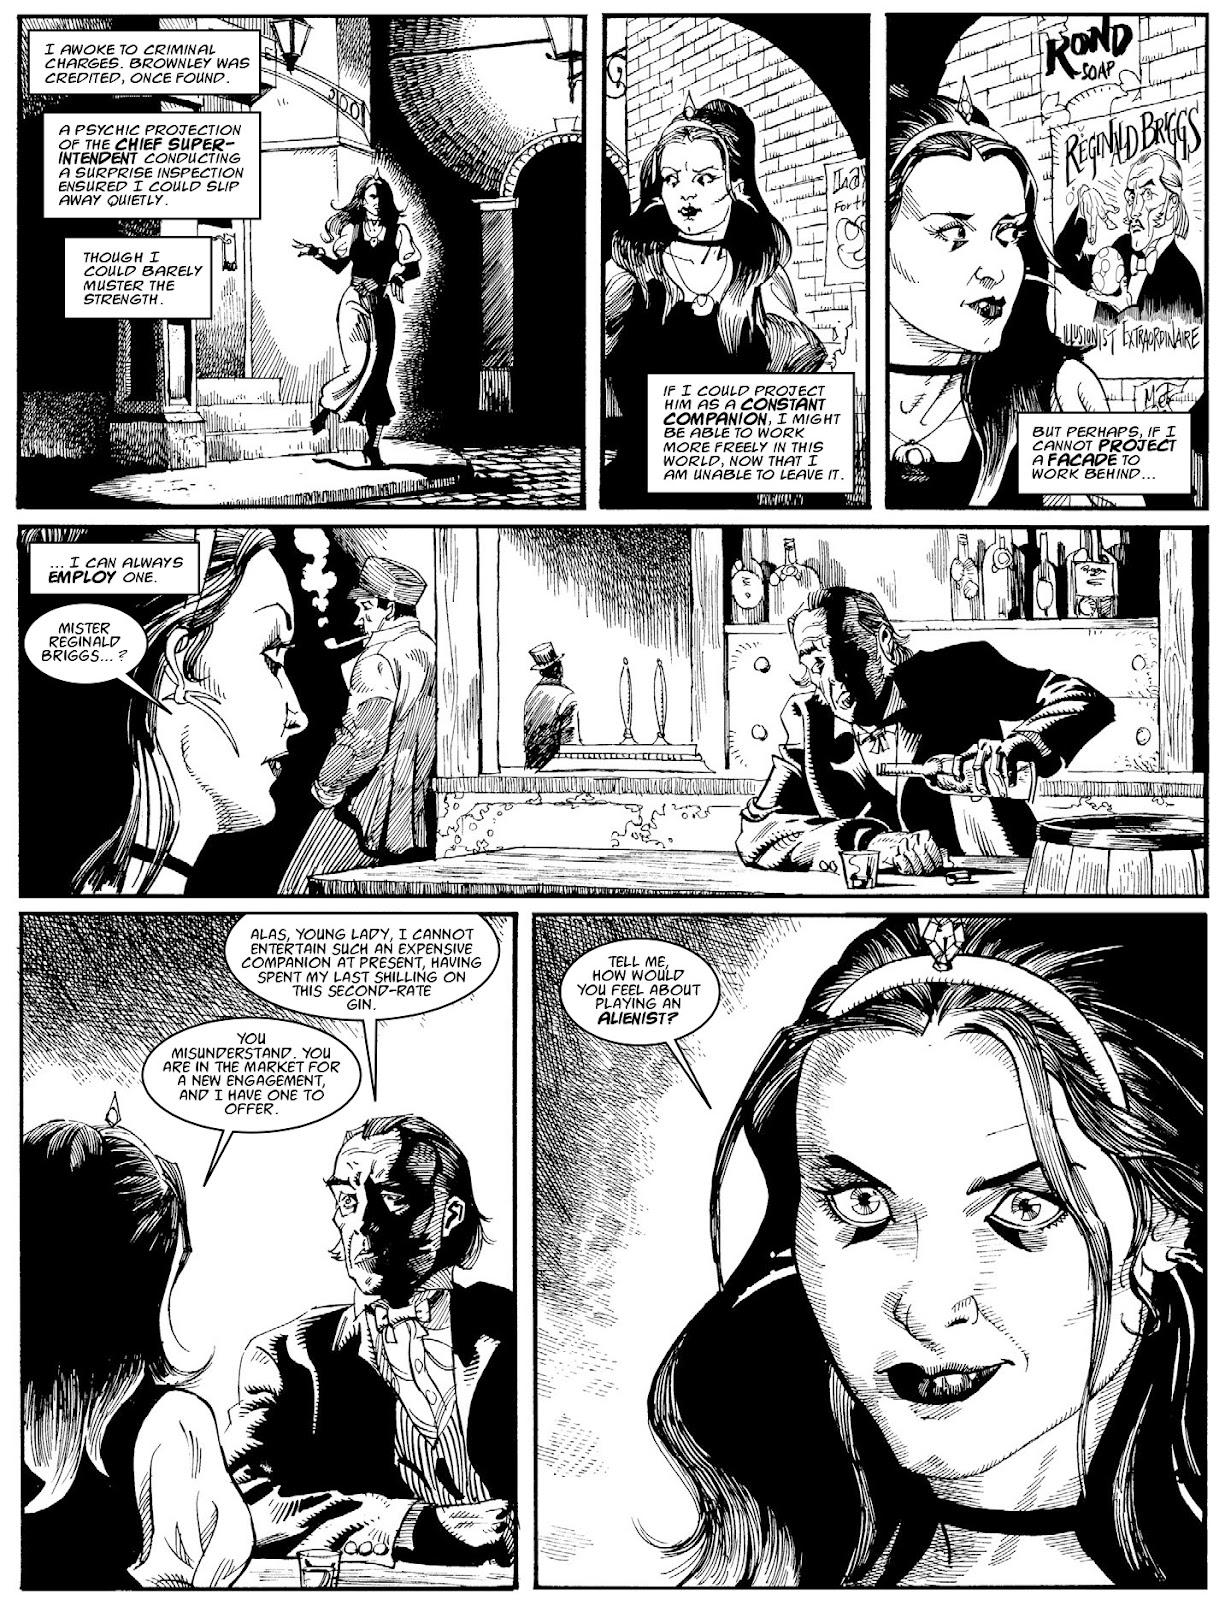 Judge Dredd Megazine (Vol. 5) issue 427 - Page 76